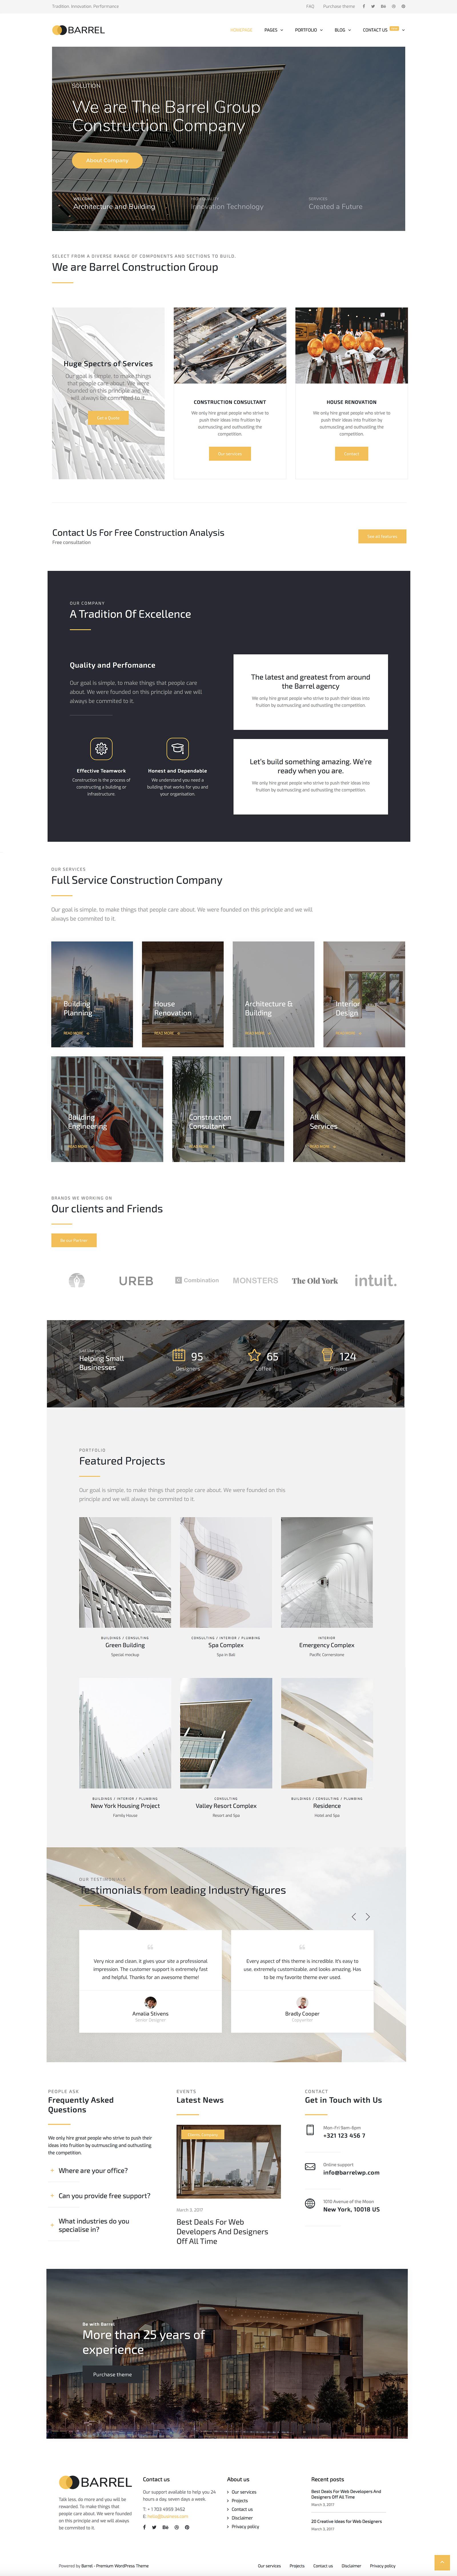 Barrel - Creative Responsive Multi-Purpose WordPress Theme by dedalx